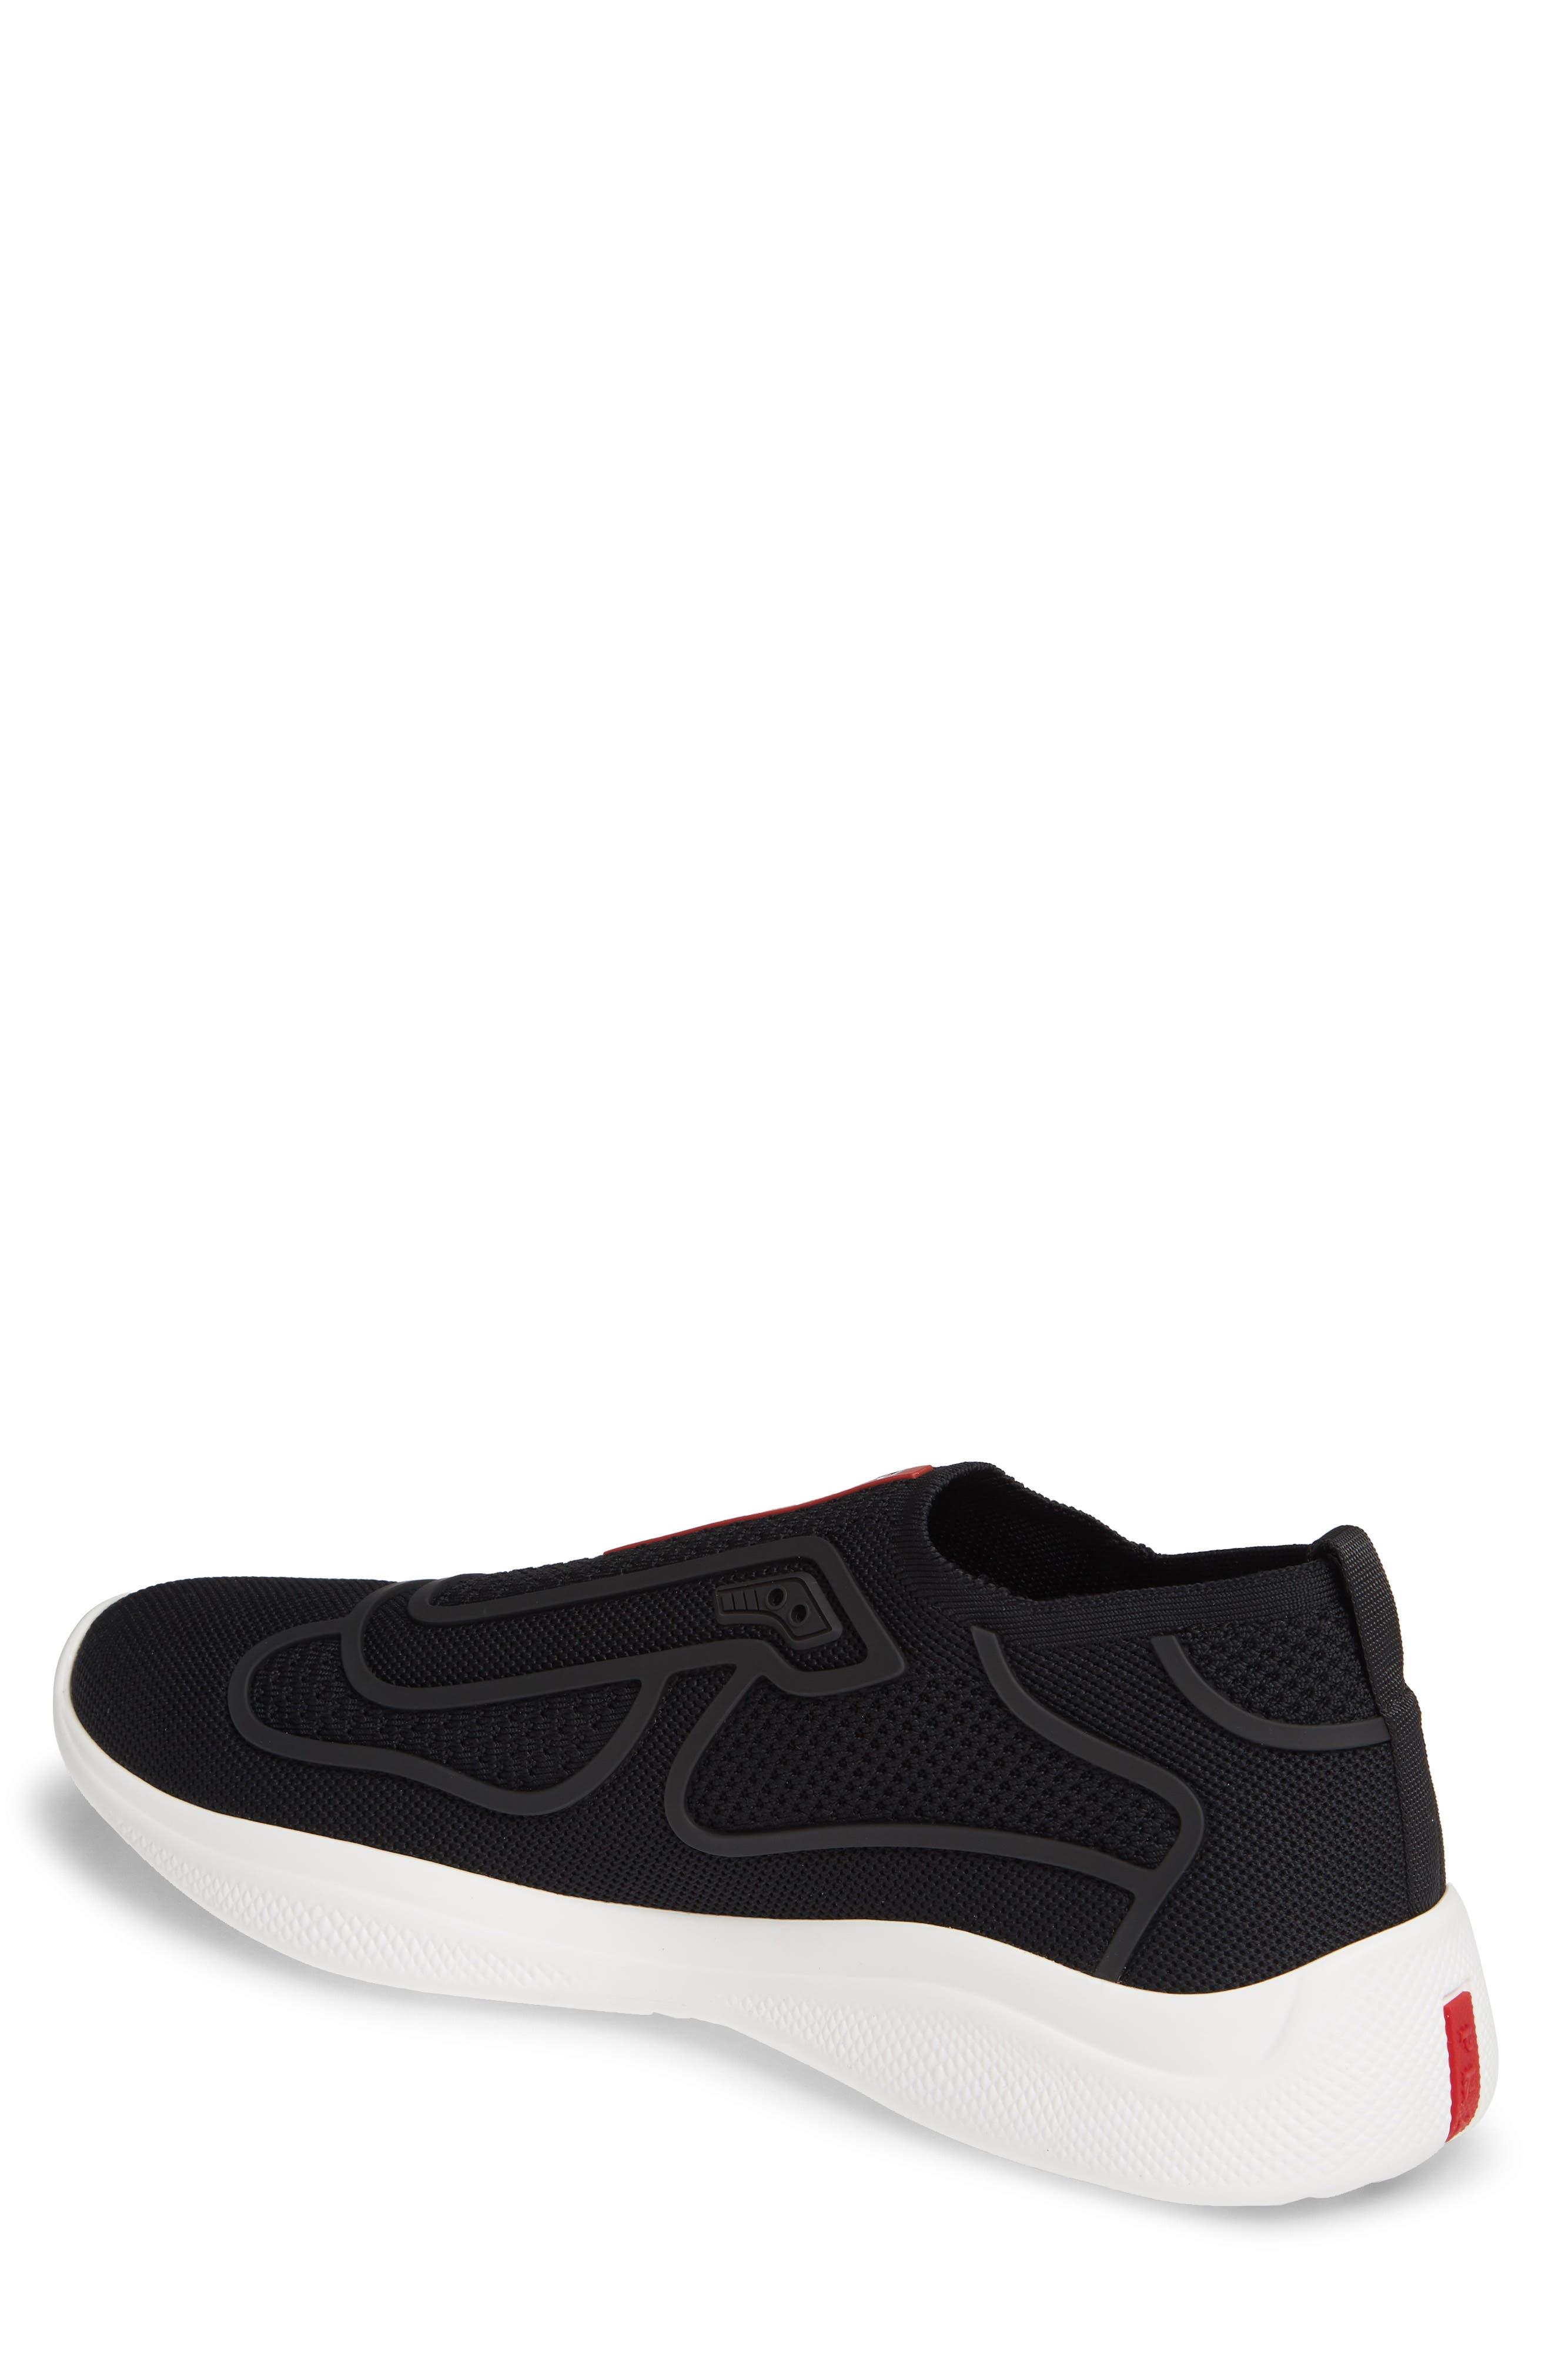 PRADA,                             Laceless Logo Sneaker,                             Alternate thumbnail 2, color,                             NERO